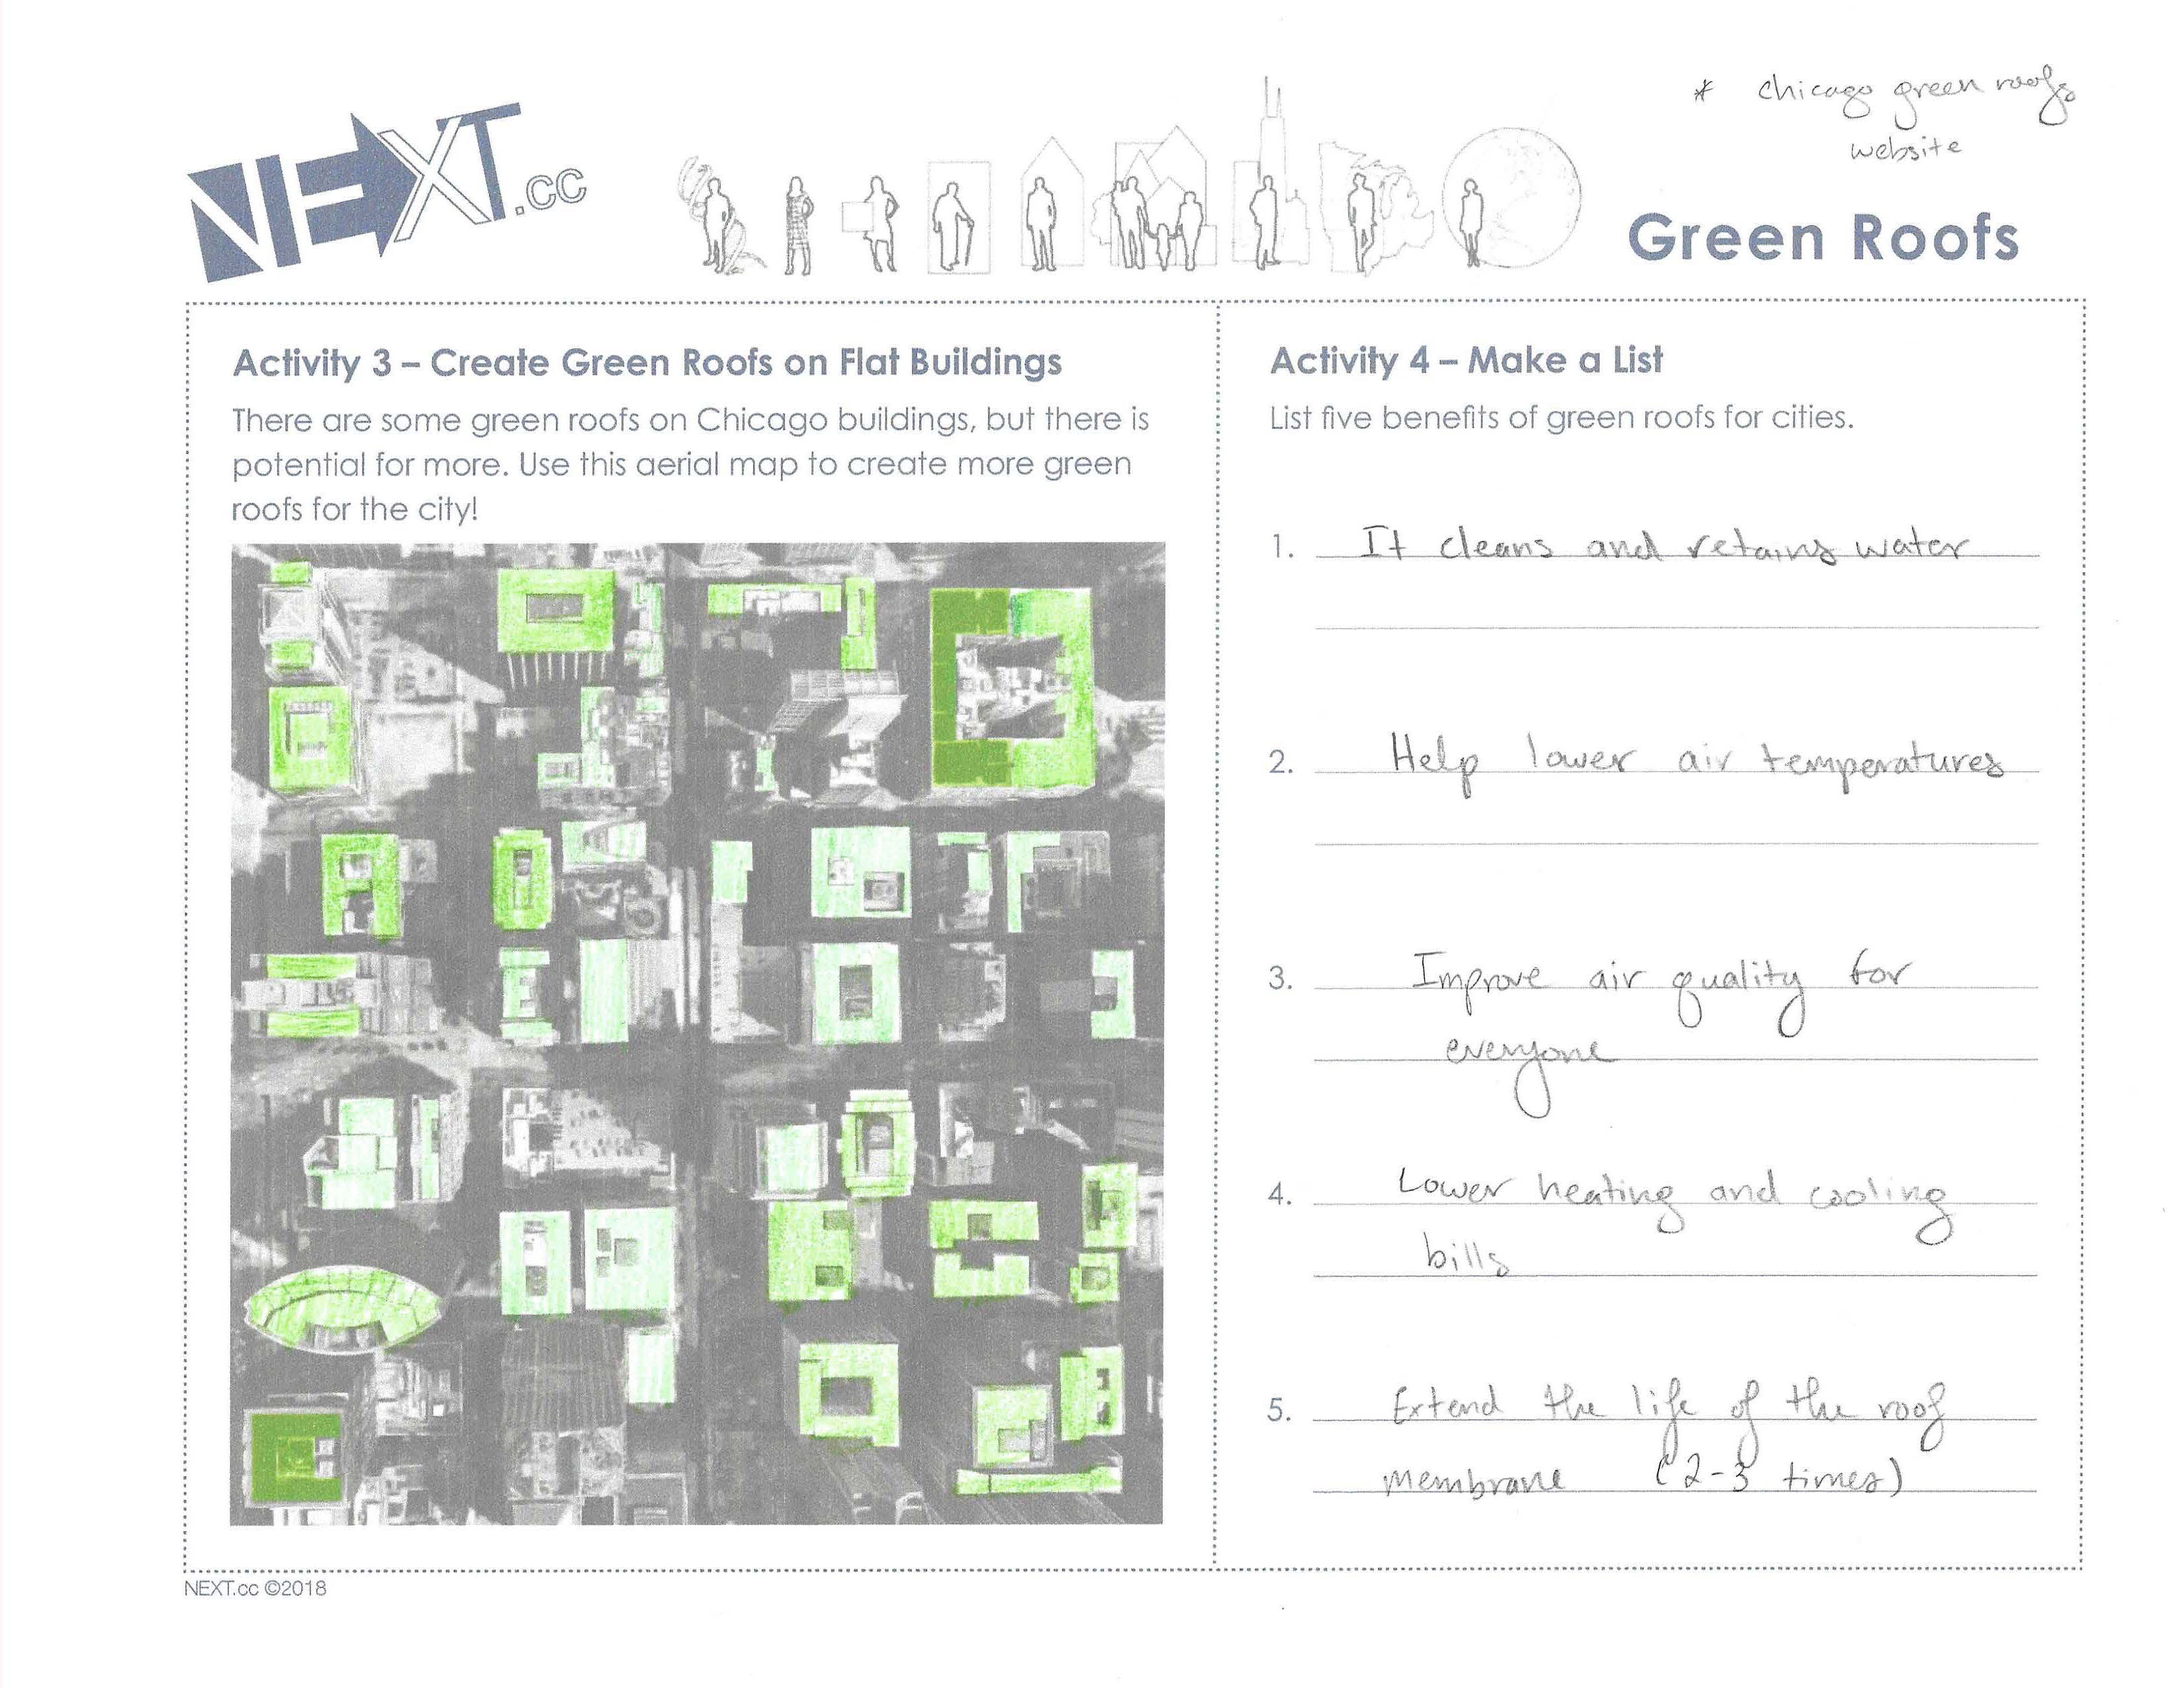 Images 1611010164 greenroofs a3 4 klaesinan